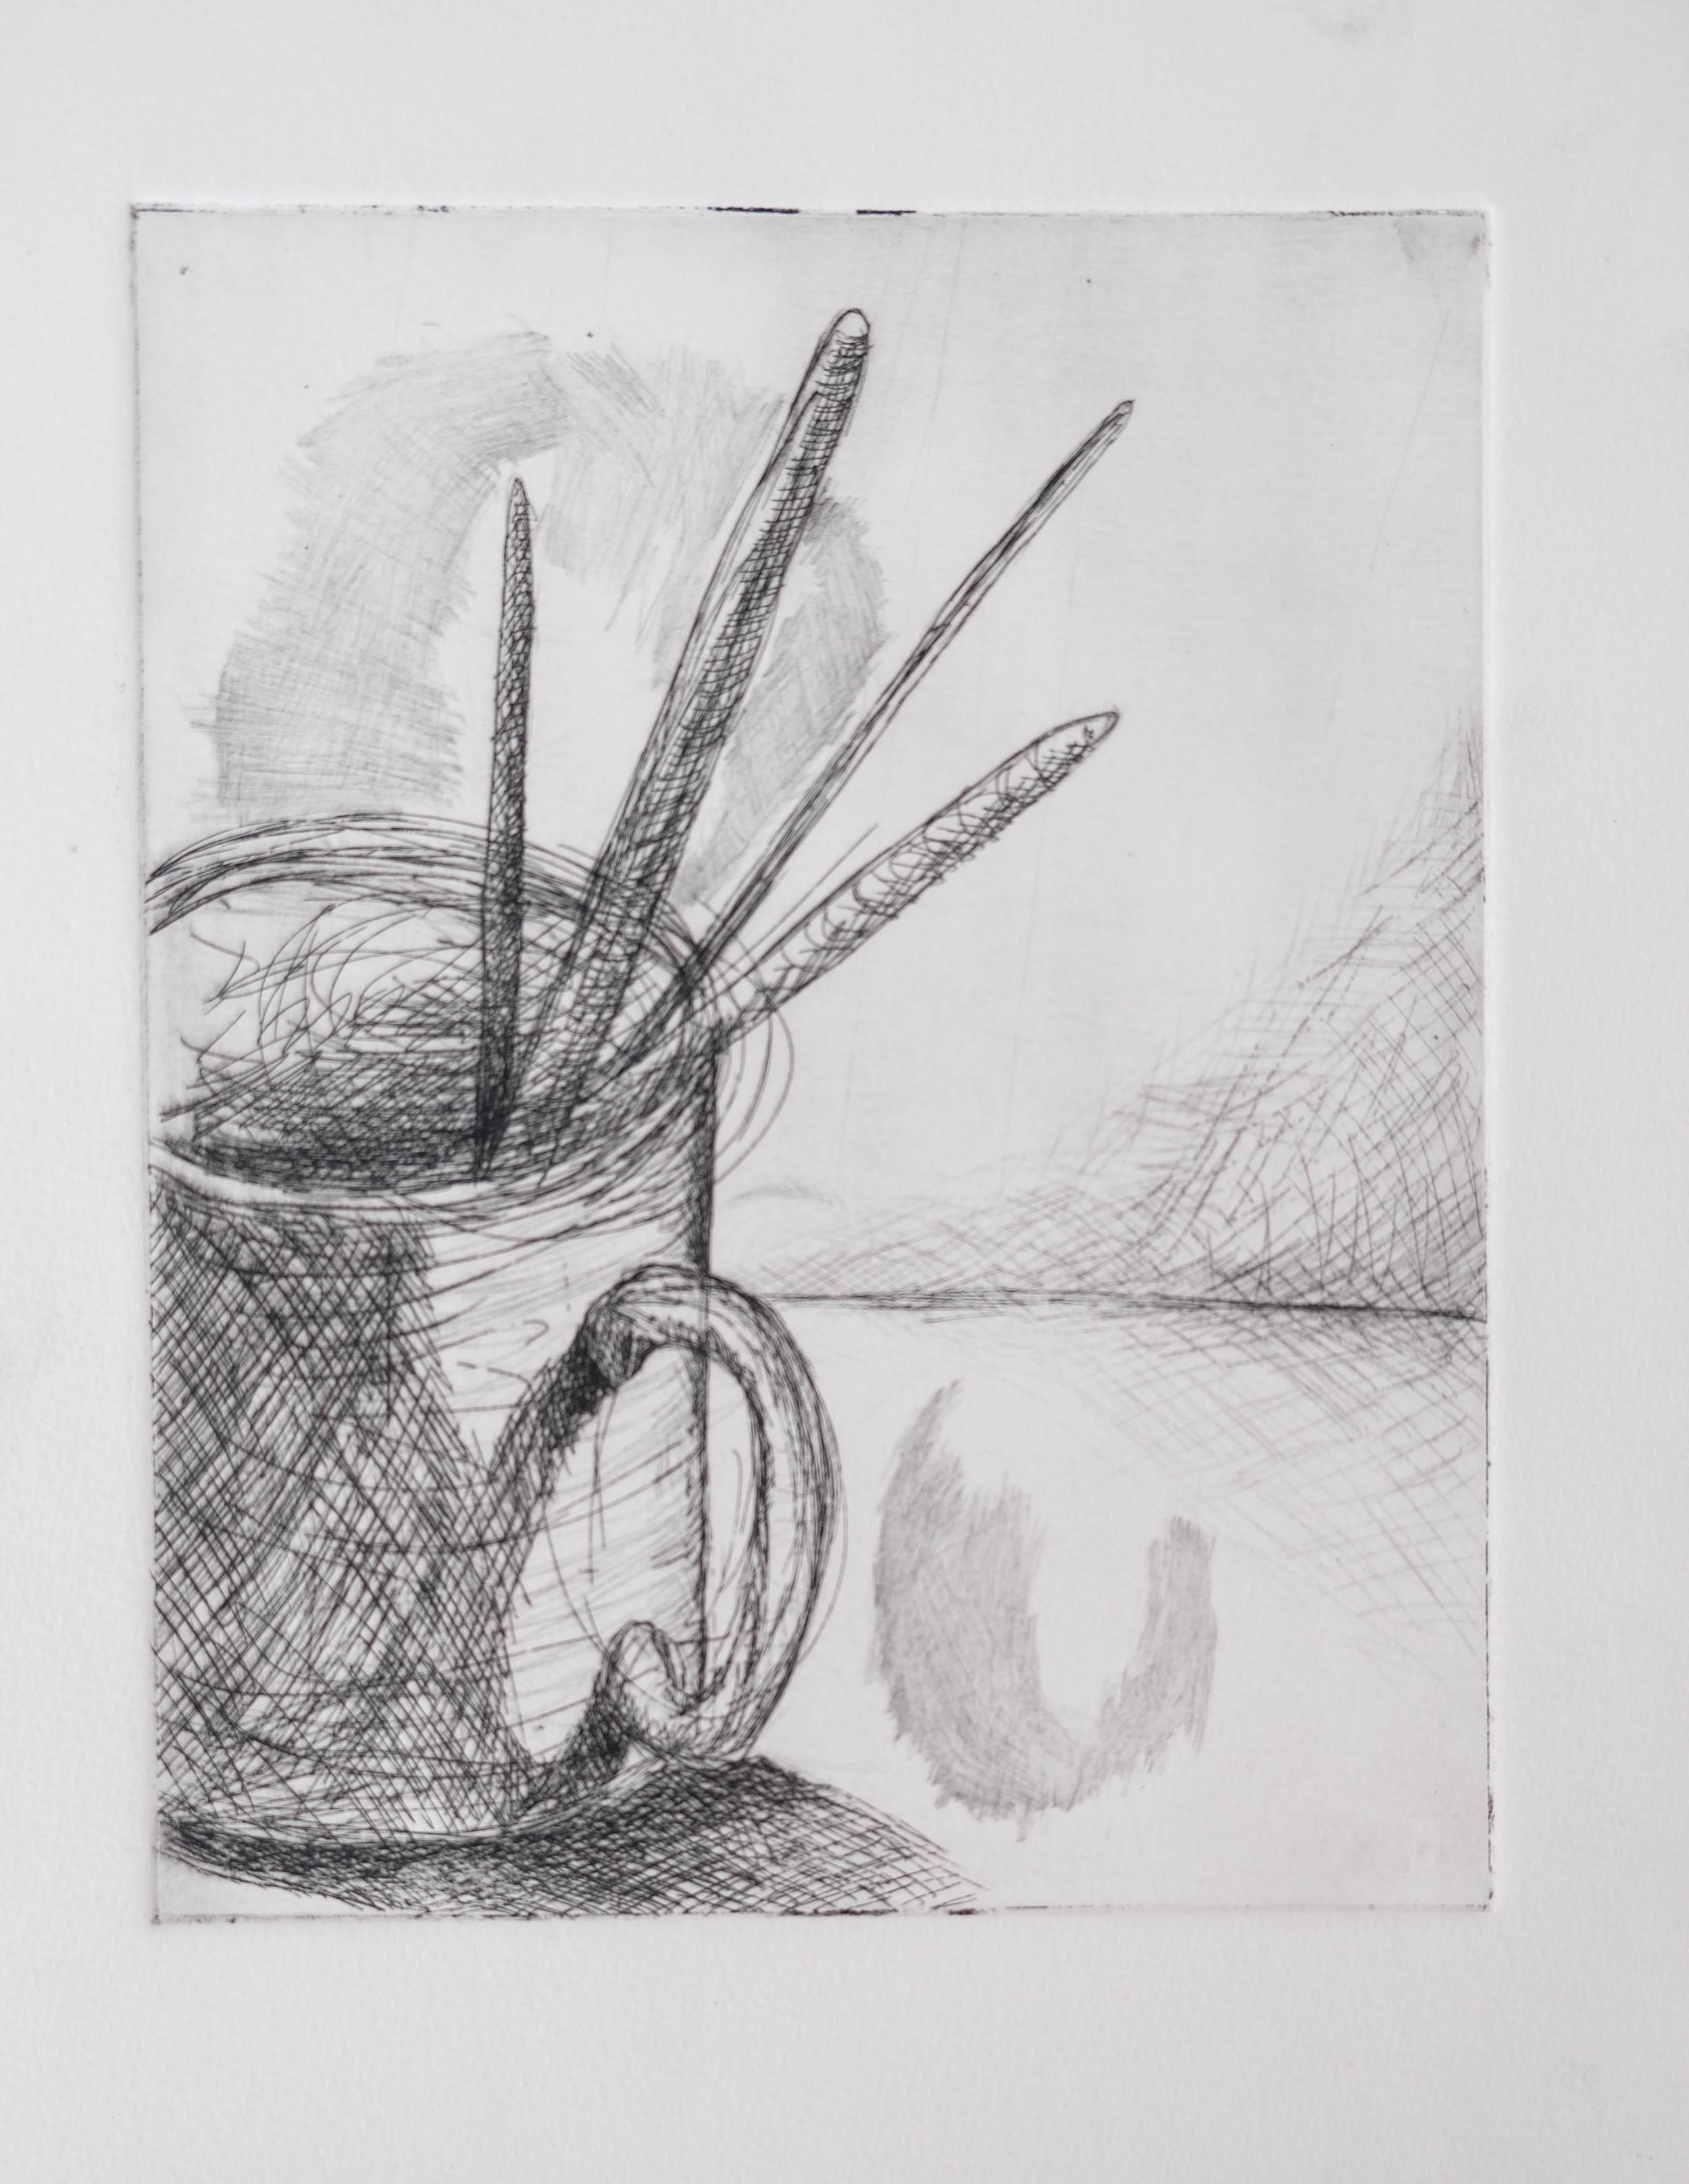 33. 29. 8x10, Etching, workprint